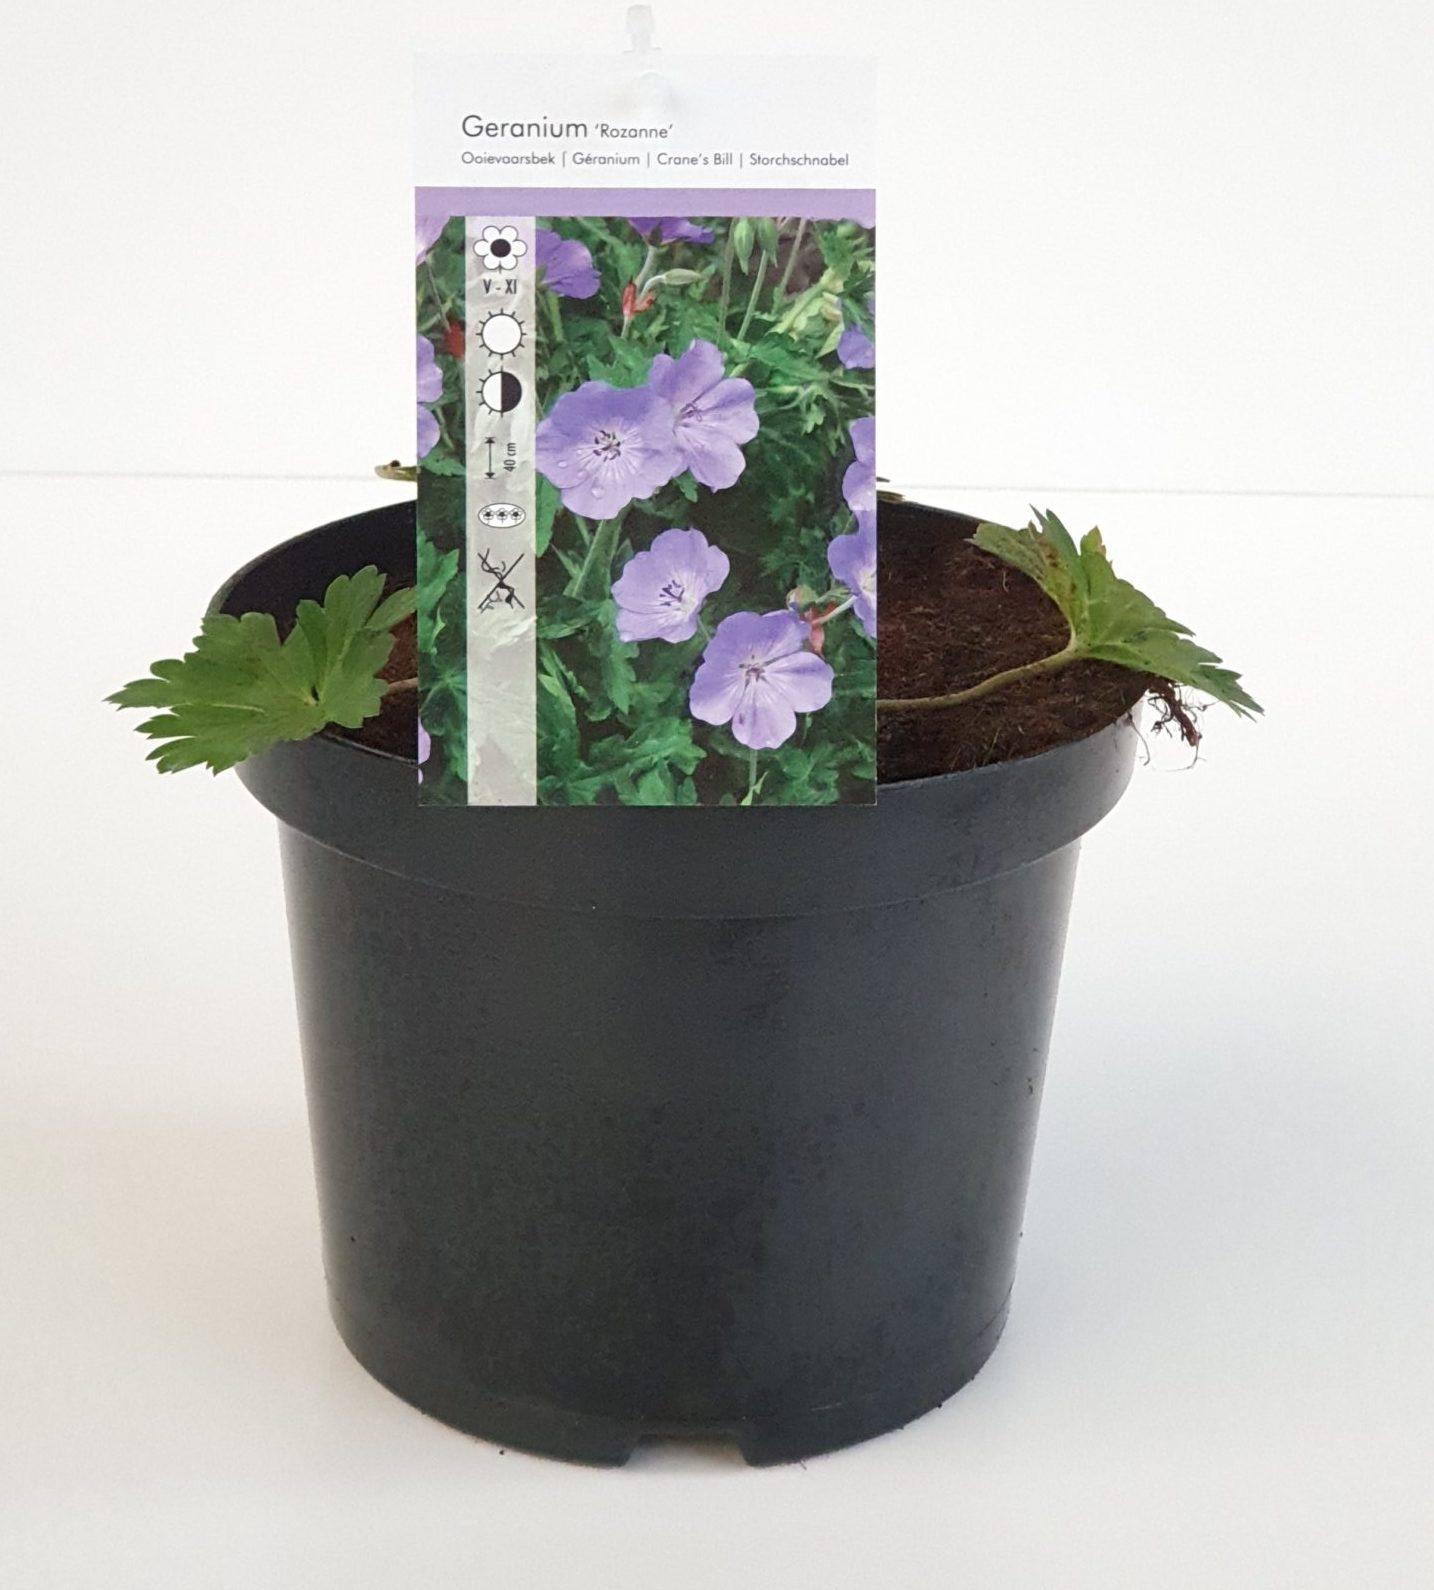 Geranium 'Rozanne' pot 3 liter